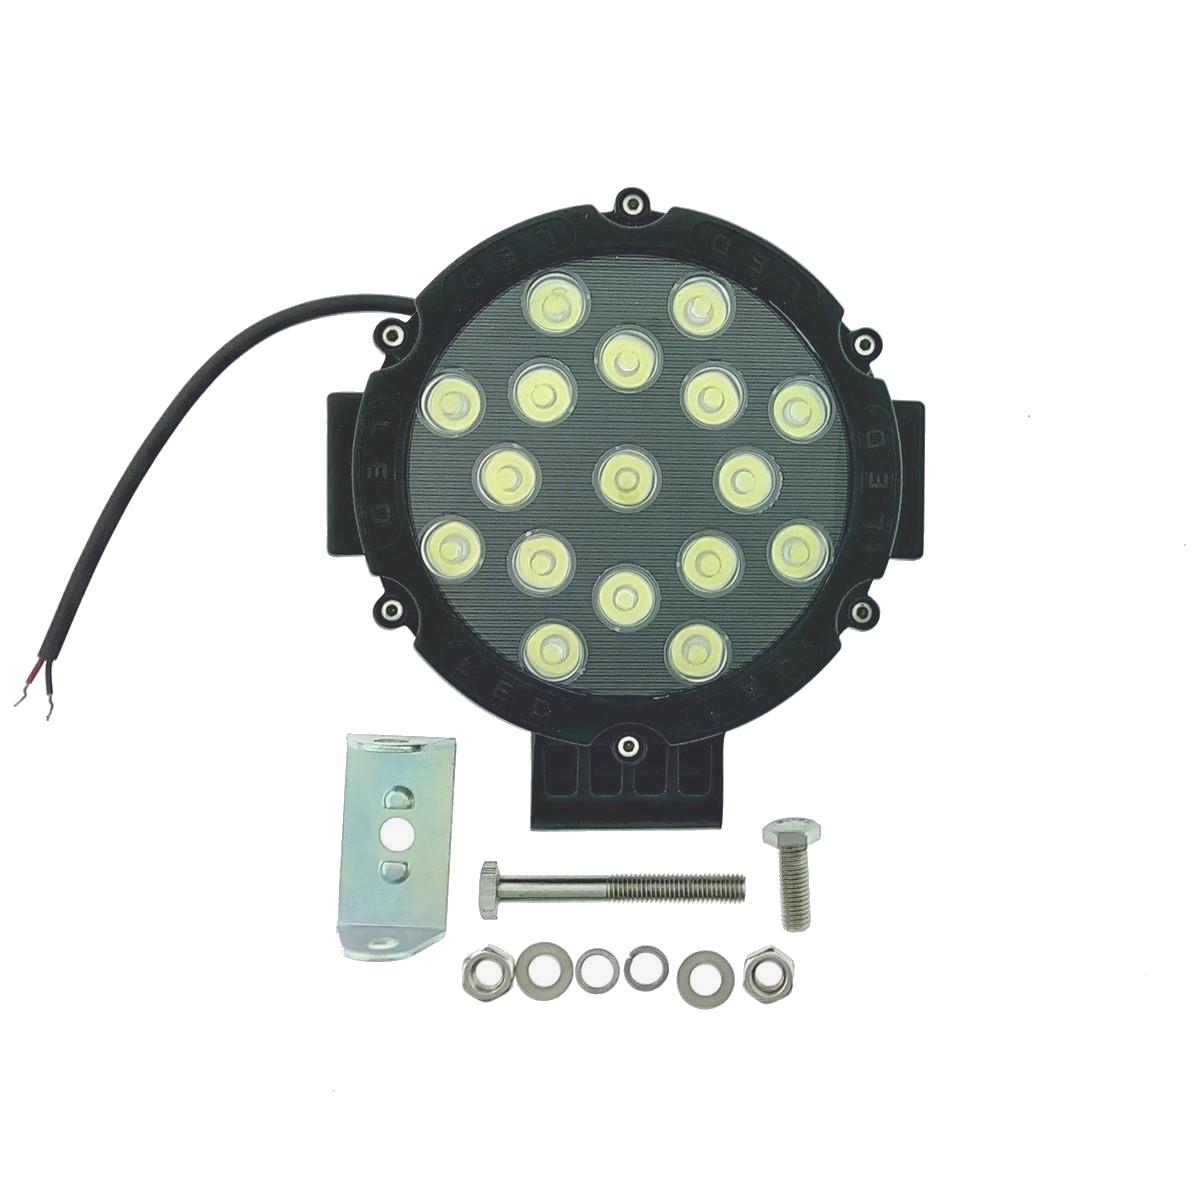 LED προβολέας αυτοκινήτου αδιάβροχος κατευθυντικός 51W 17 SMD 6000K – CP1204 – 10~30V